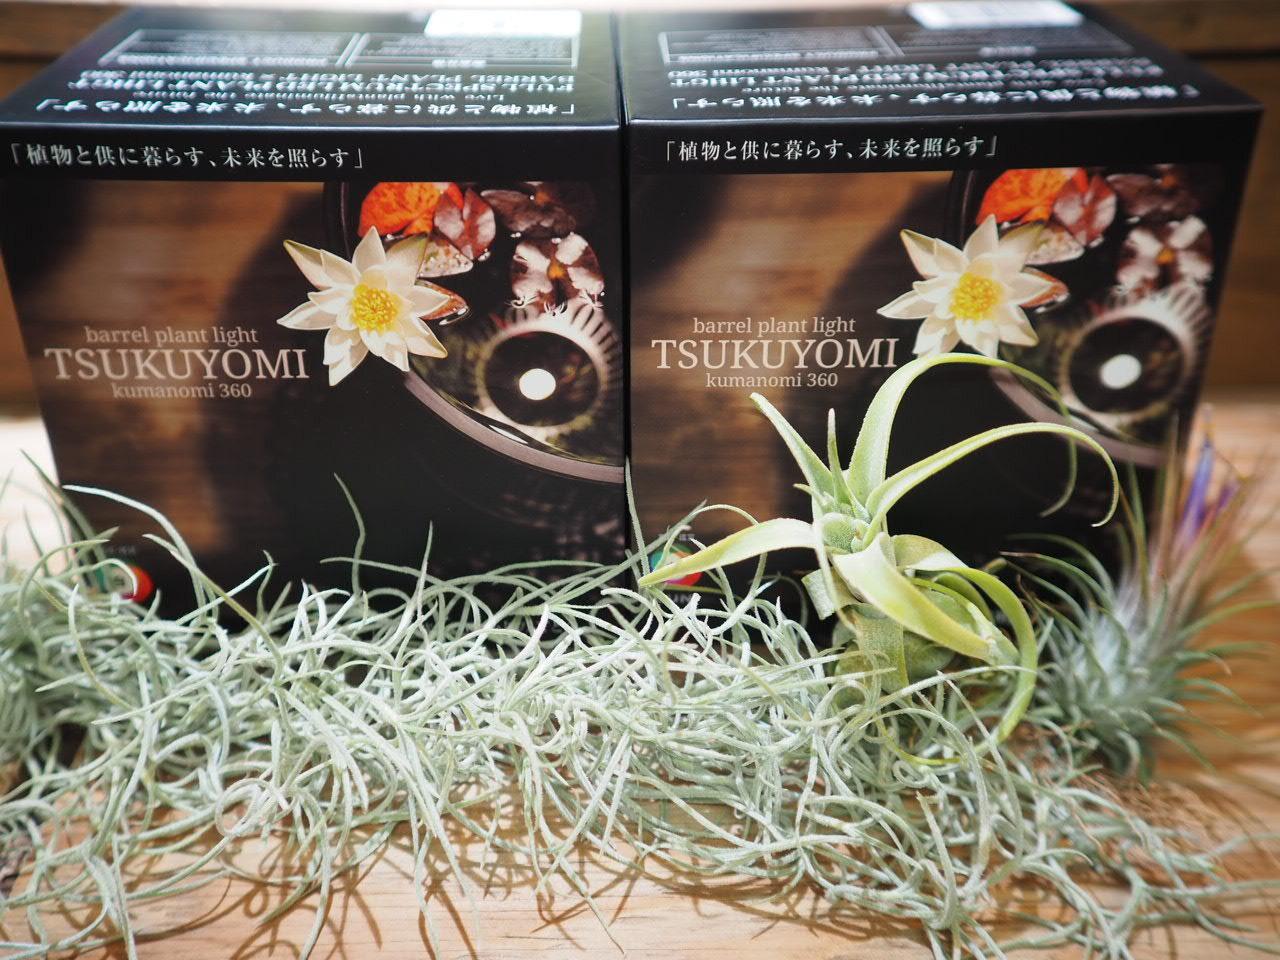 ◆ TSUKUYOMI LED / 太陽光に近似の植物育成ライト (超高演色:Ra97) × 2個Set